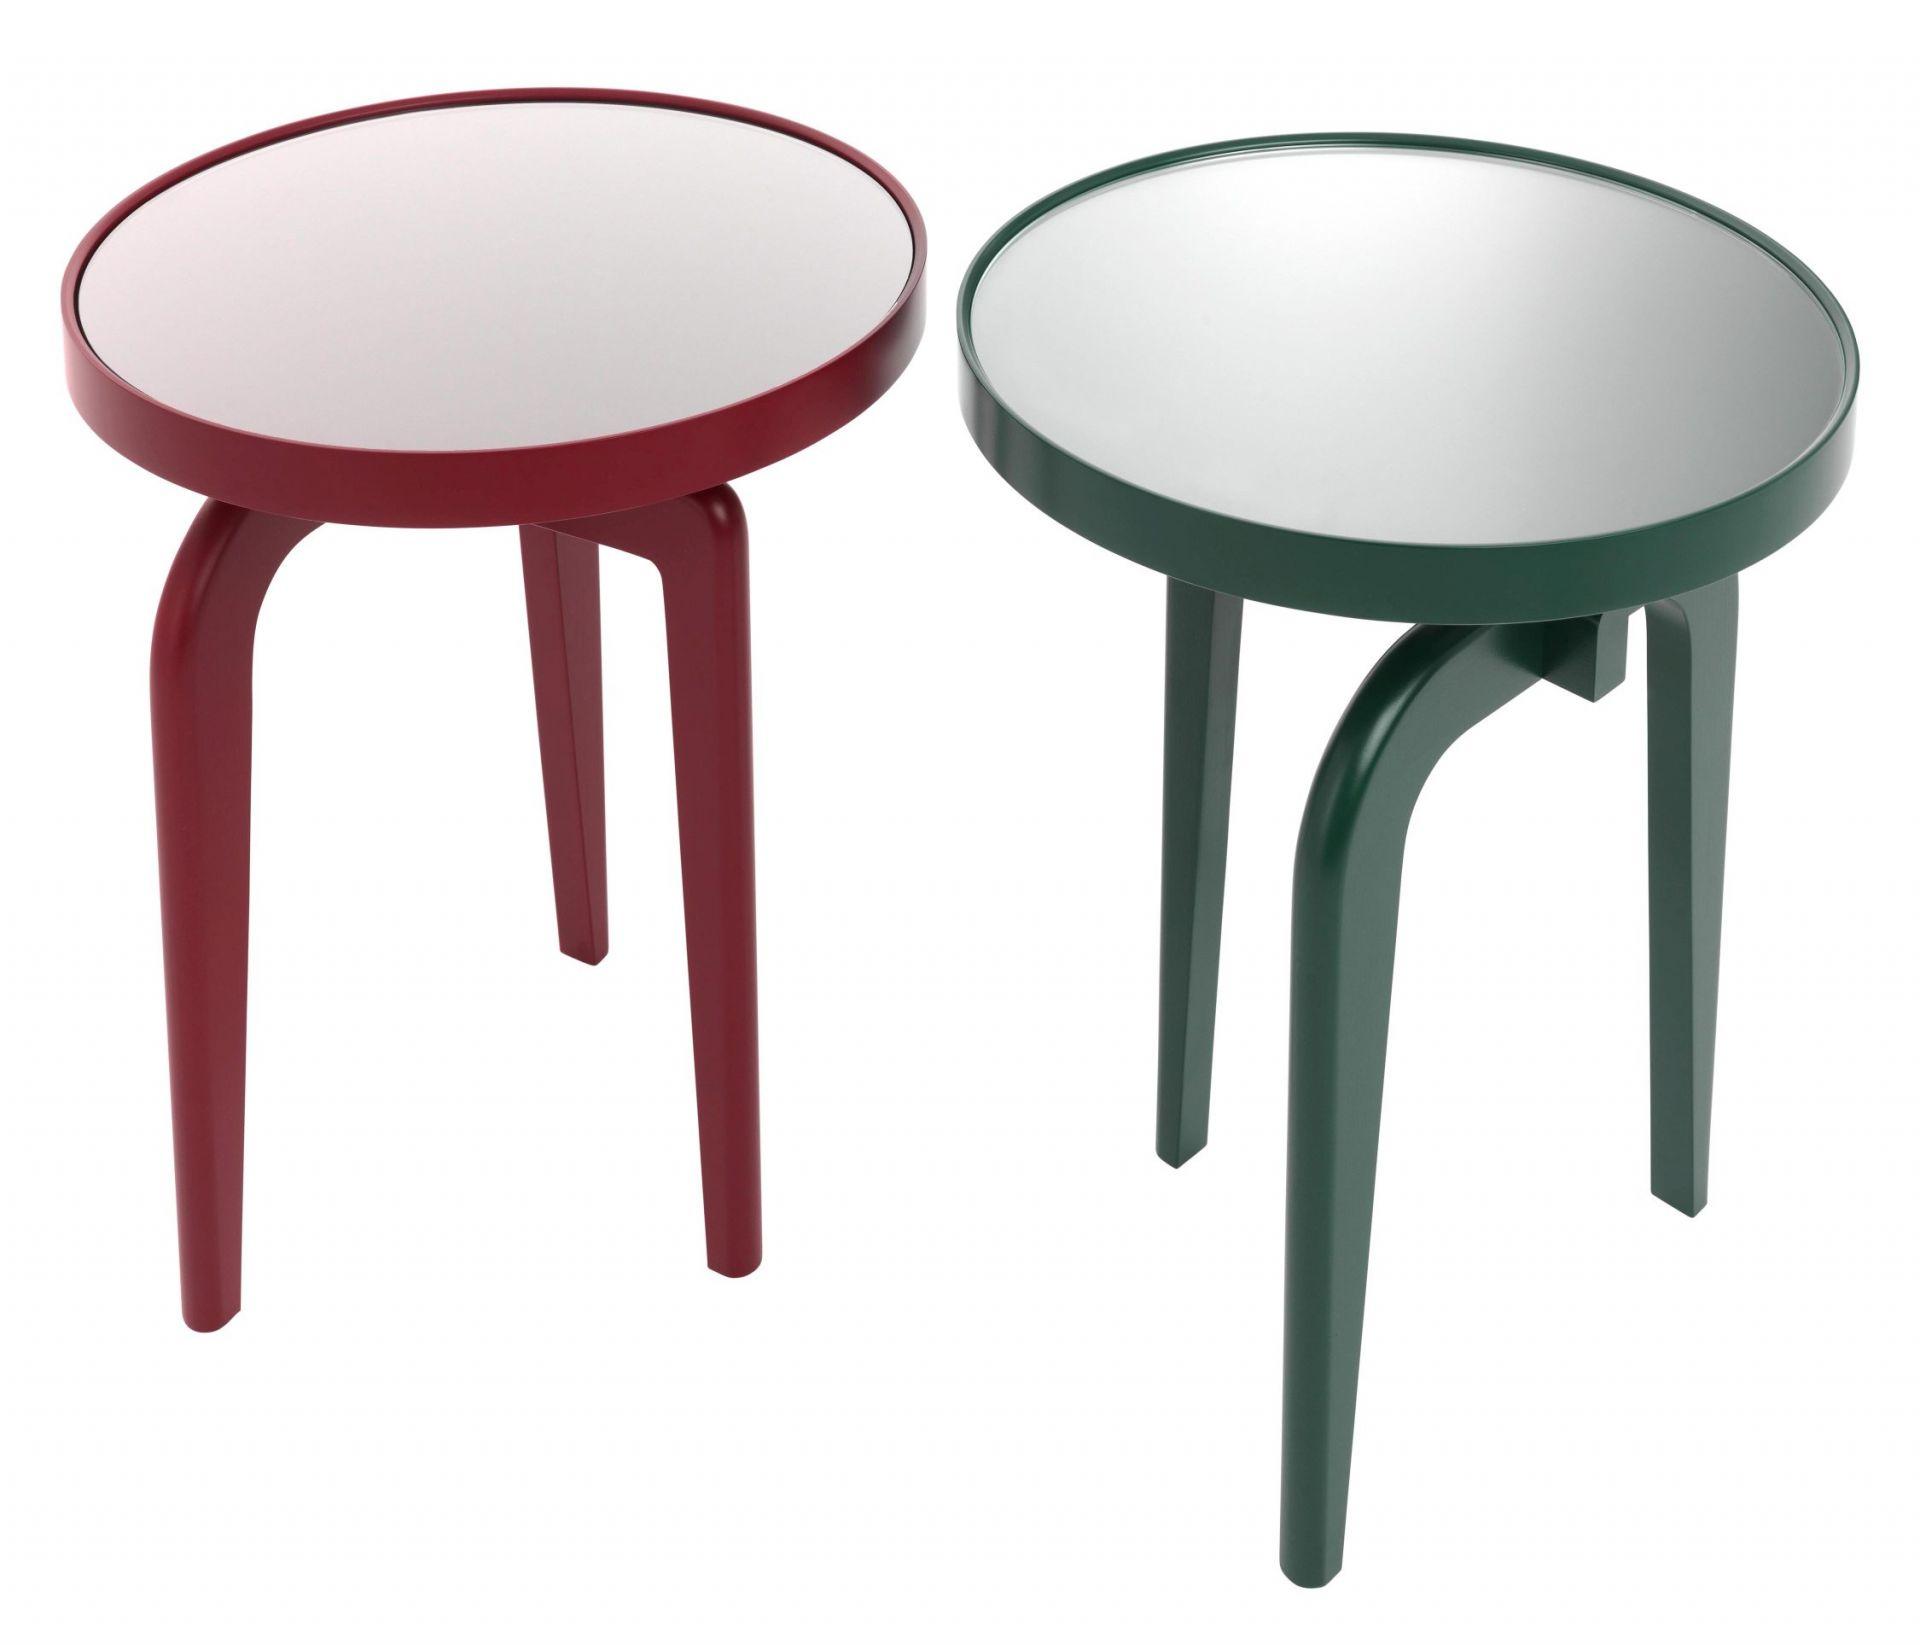 Table d'appoint Fourmi, inserts en verre transparent Schönbuch